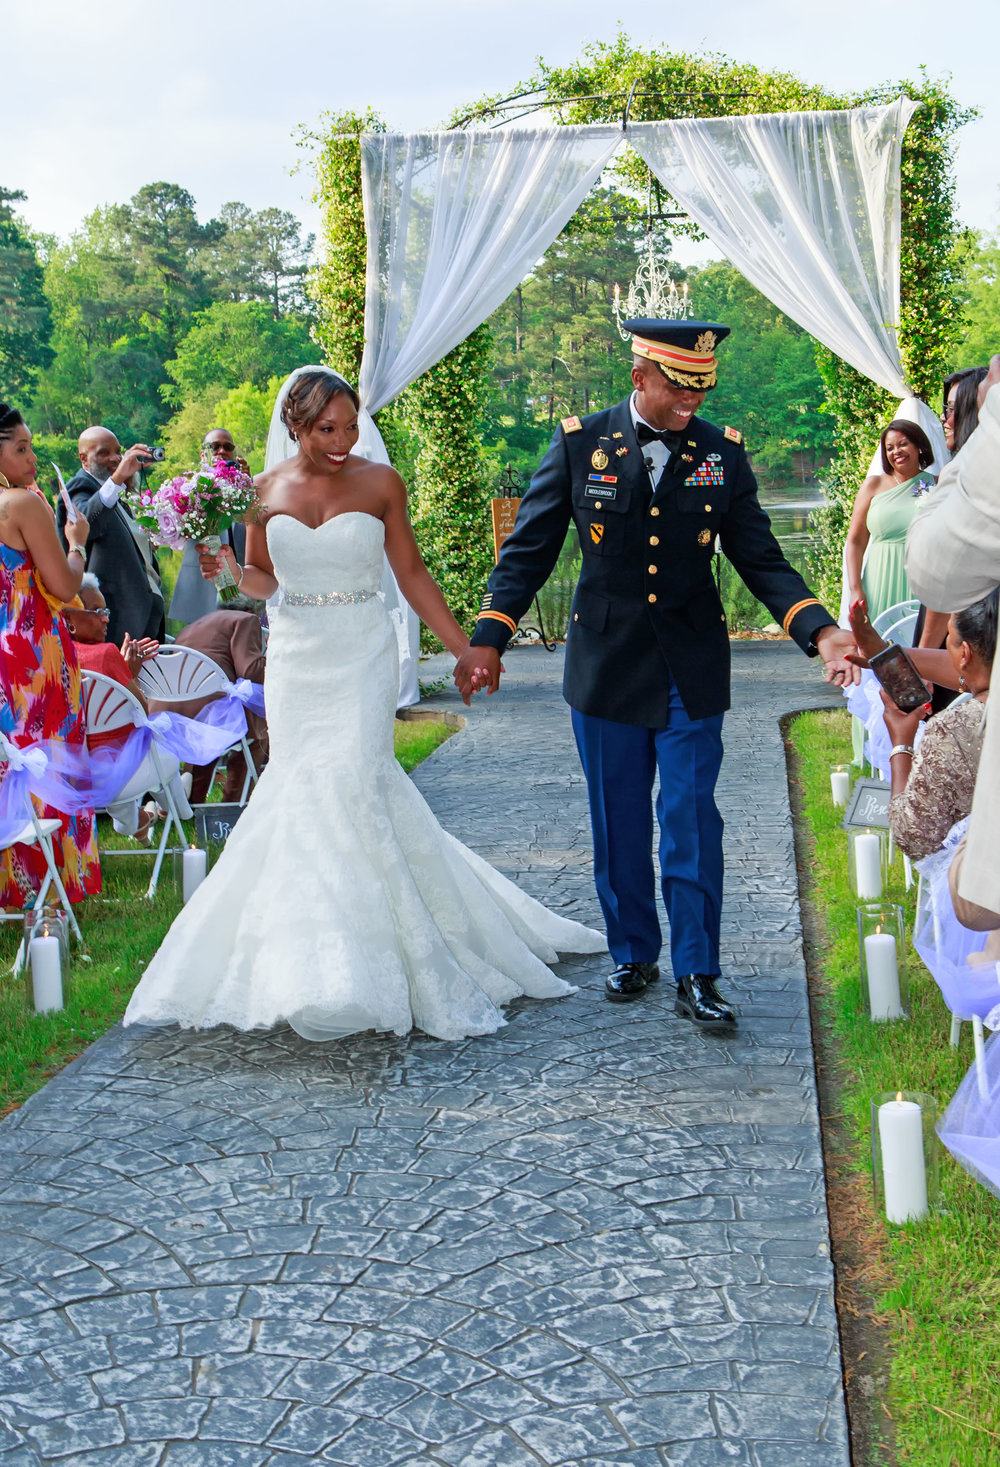 NC-Wedding-Vizcaya-Villa-Fayetteville-Ceremony-103.jpg